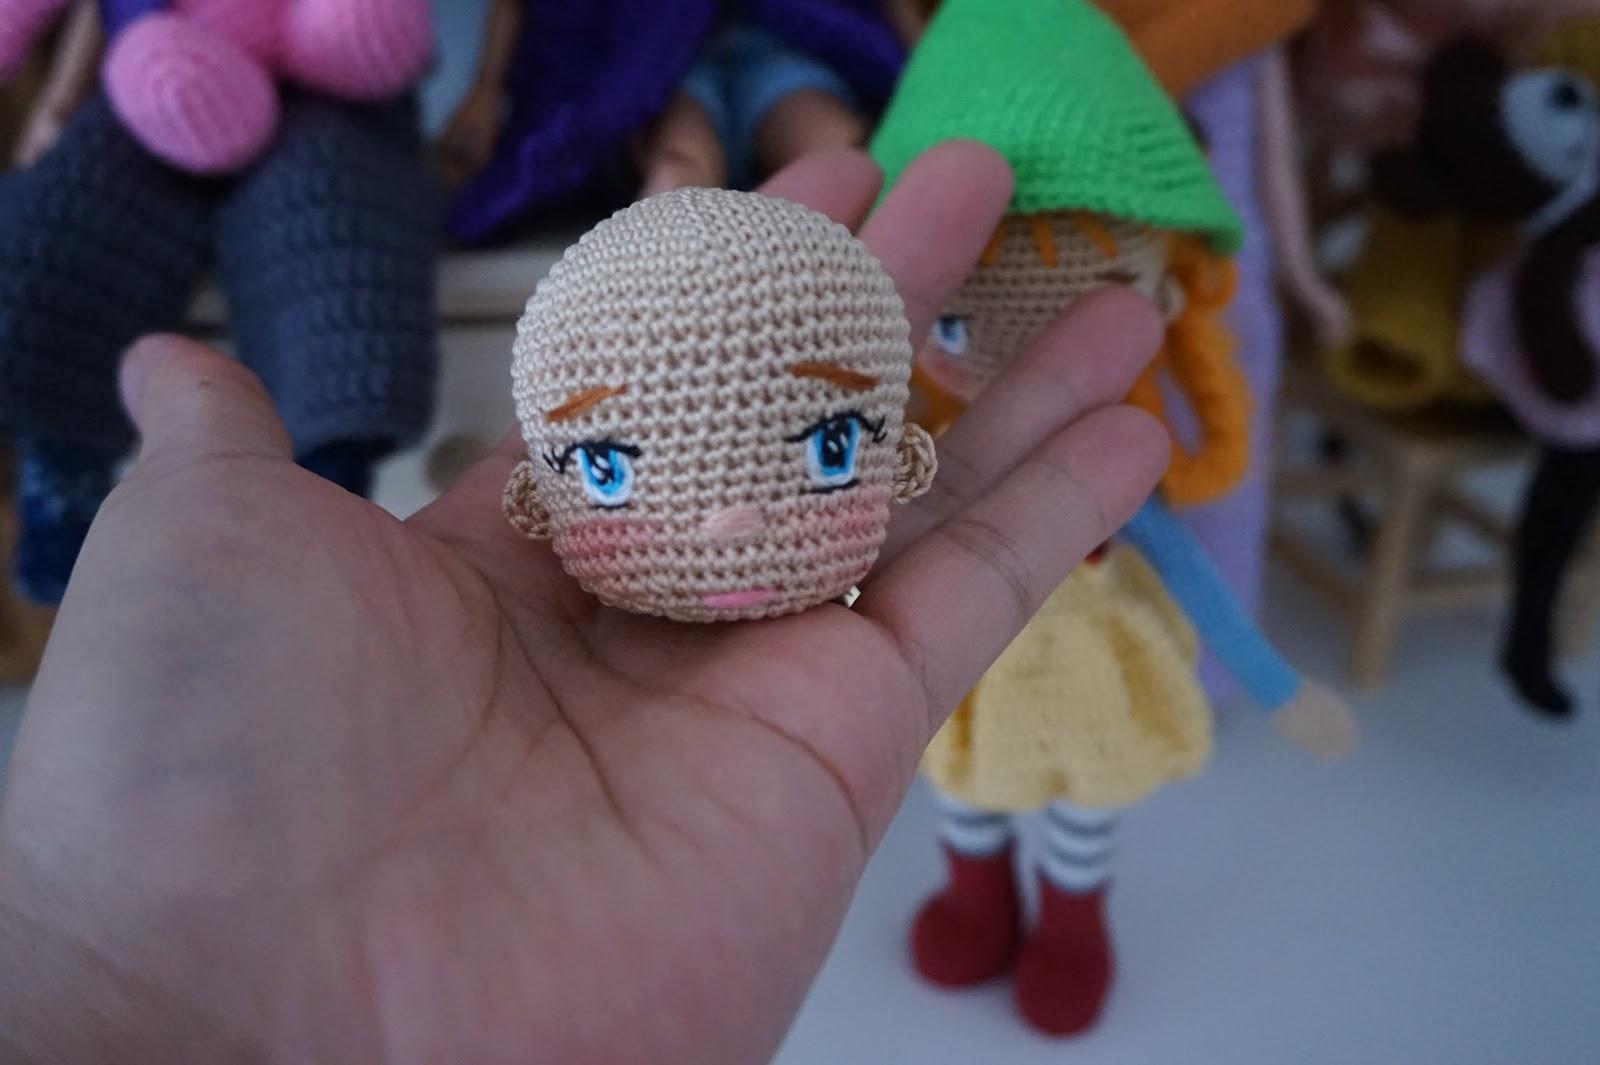 Crochet Doll. A Cute Teddy Bear Amigurumi Doll With Bow On Her ... | 1065x1600